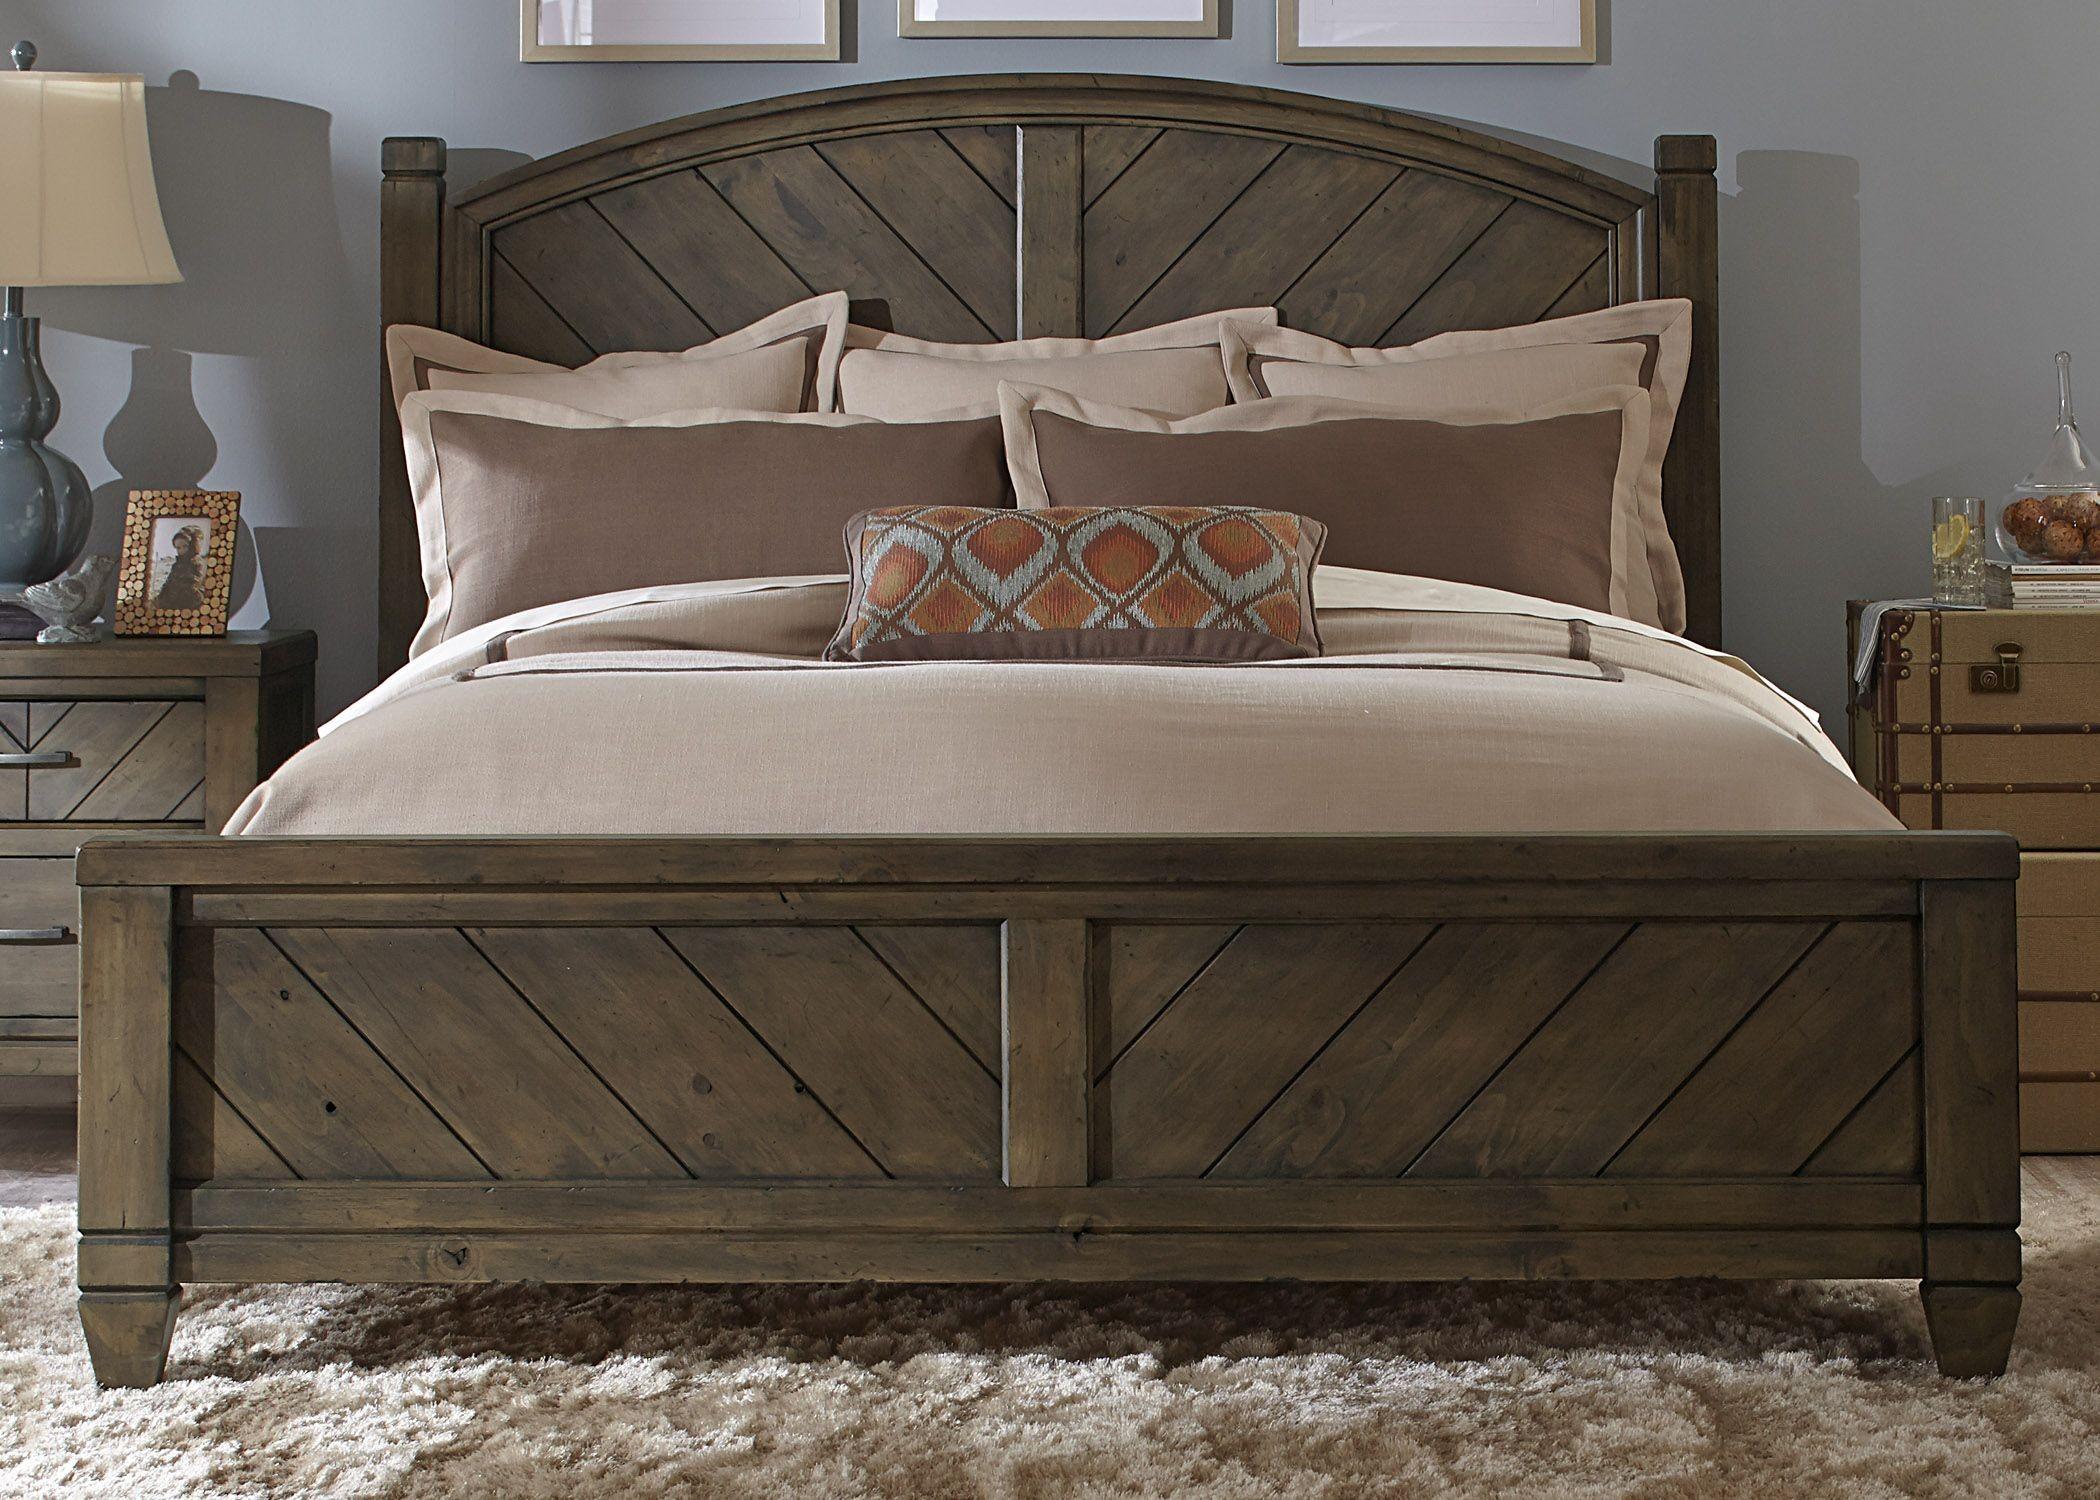 modern country poster bedroom set from liberty 833 br qps coleman furniture. Black Bedroom Furniture Sets. Home Design Ideas